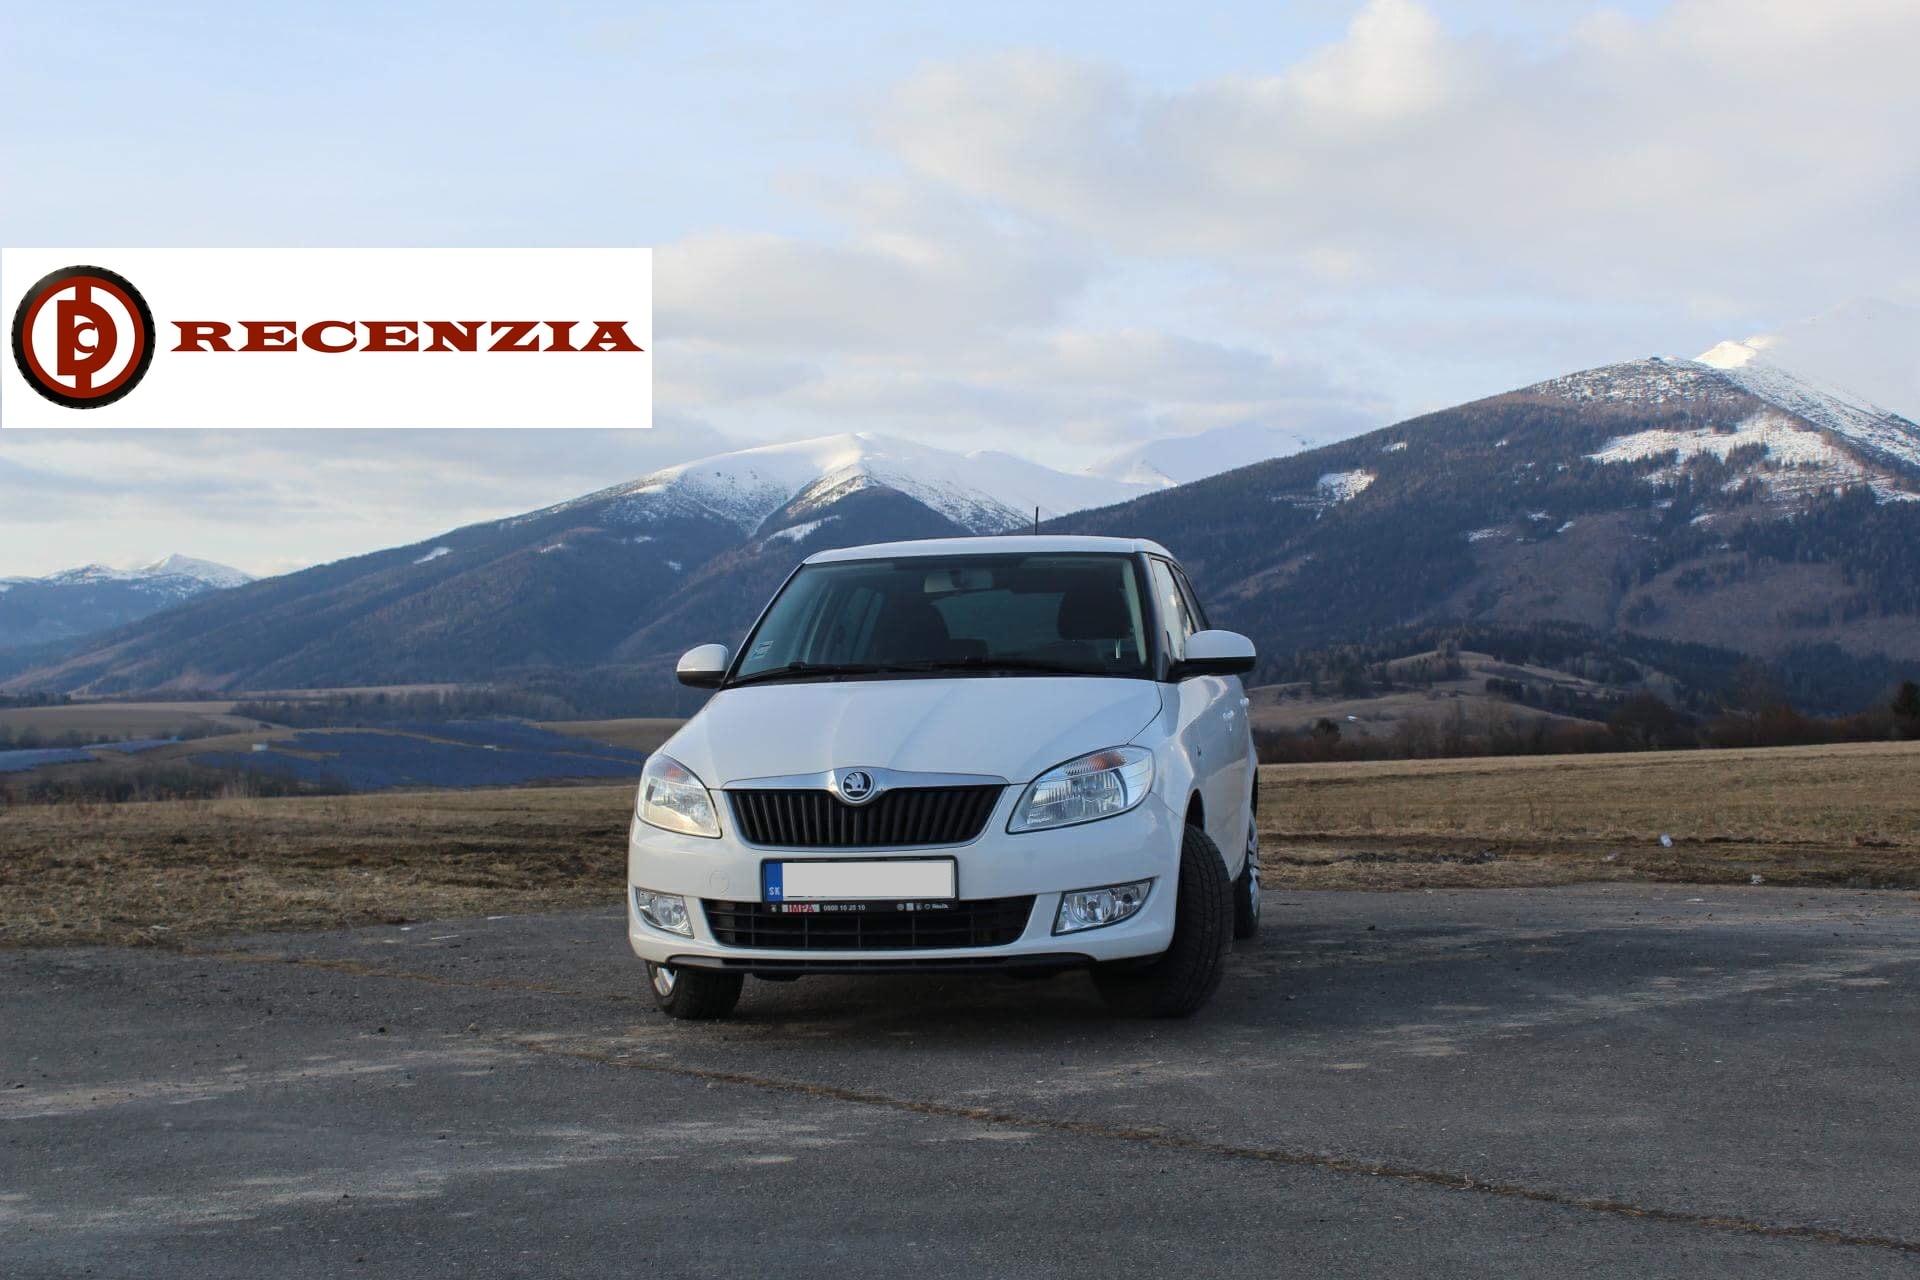 TEST Jazdenky Škoda Fabia 1.2 HTP 2. gen